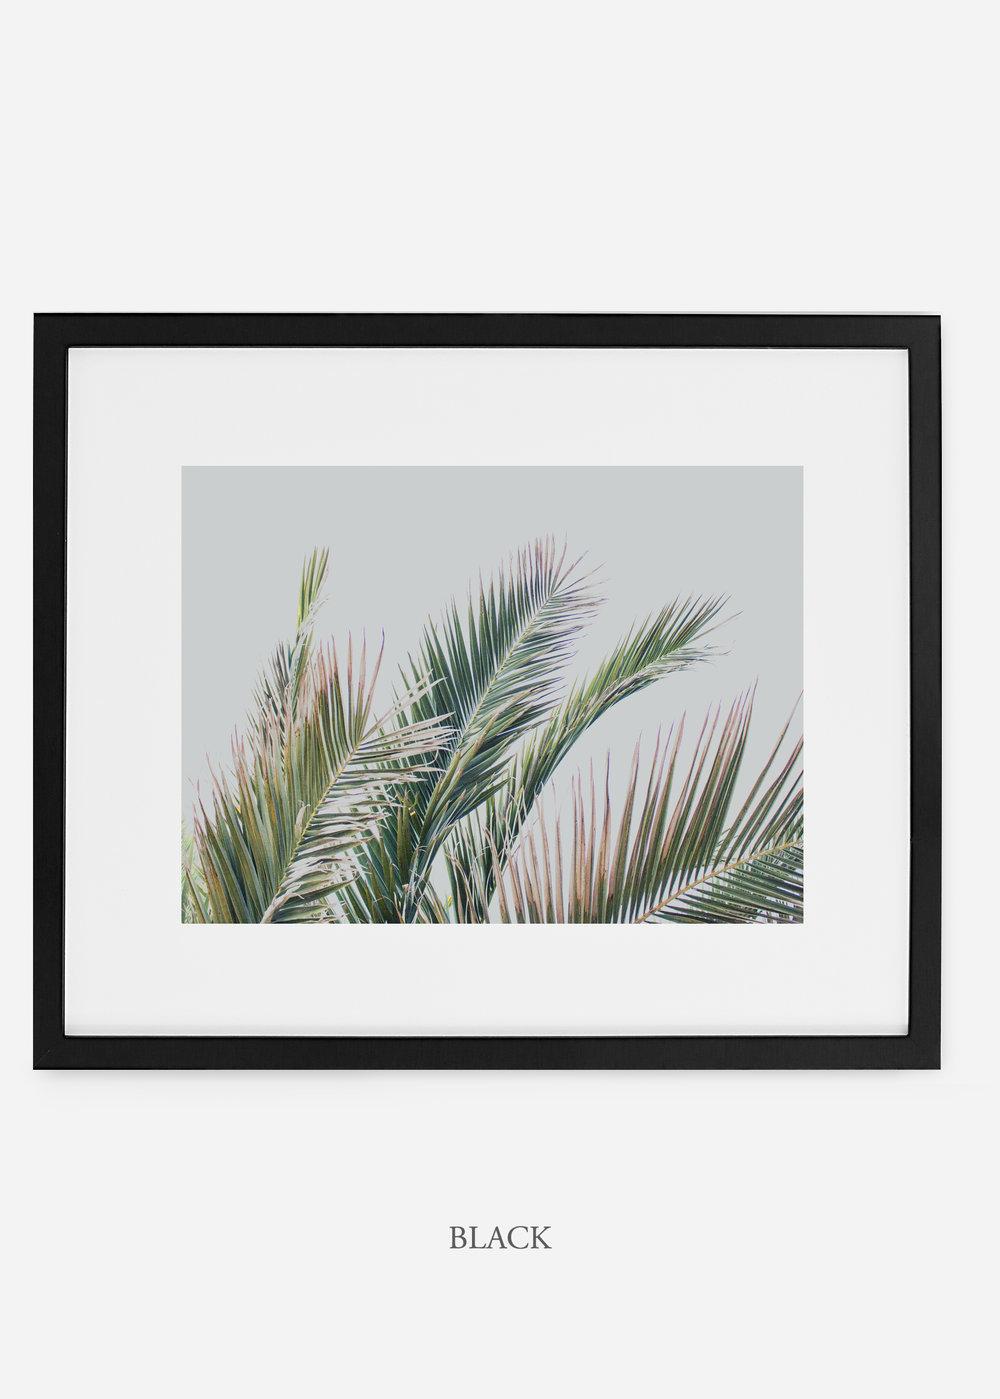 interiordesign_blackframe_art_tropical_palmtree_StormyGrayPalm.jpg